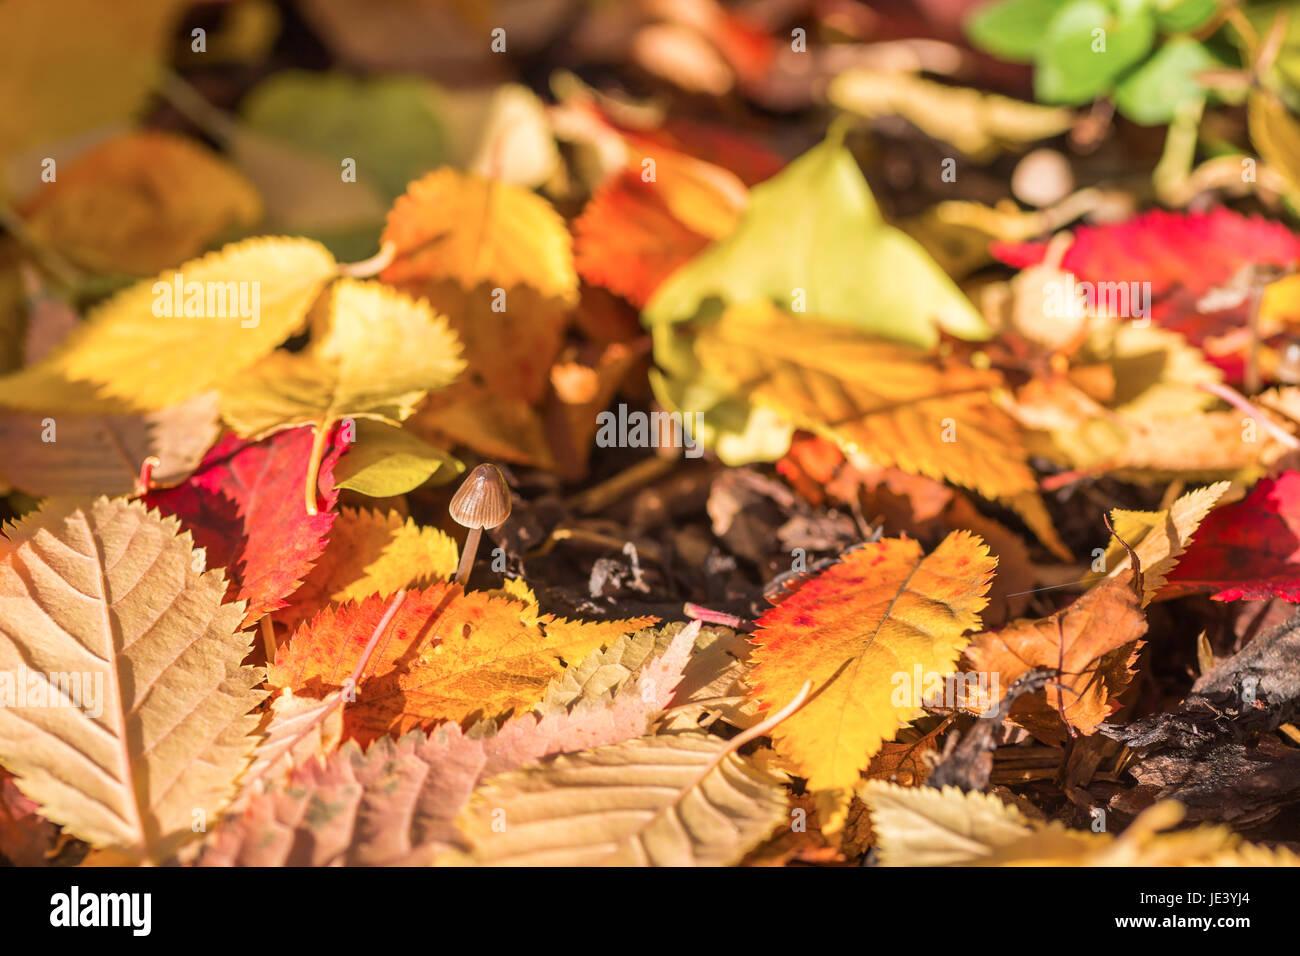 Buntes Herbstlaub mit kleinem Pilz - Stock Image